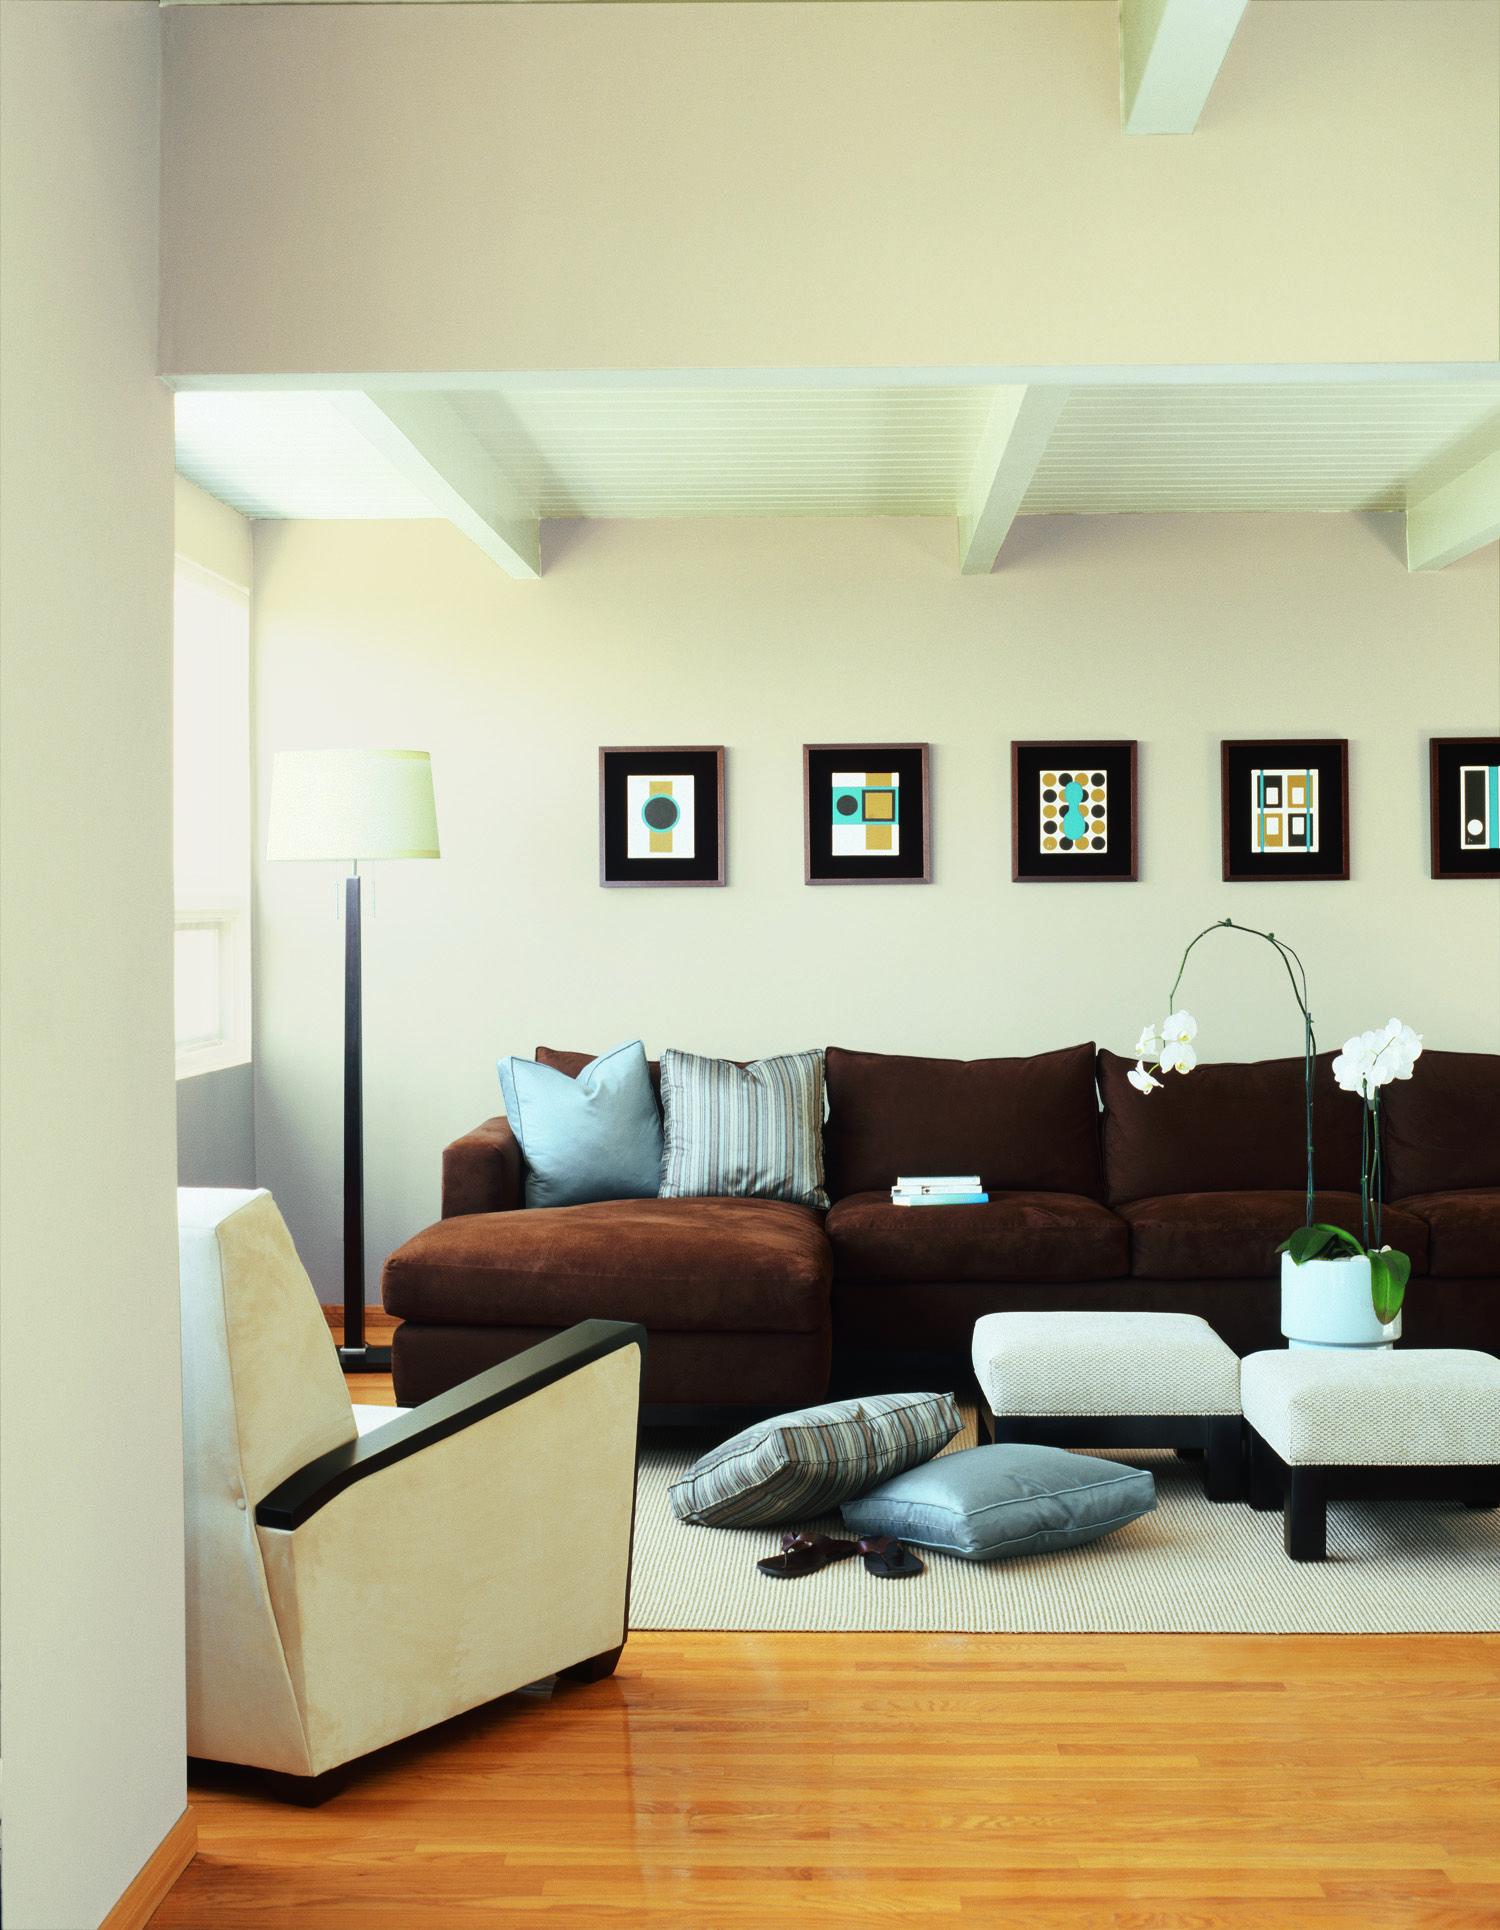 Dunn edwards paints paint colors wall porous stone de6220 trim white dew380 click for a free color sample dunnedwards